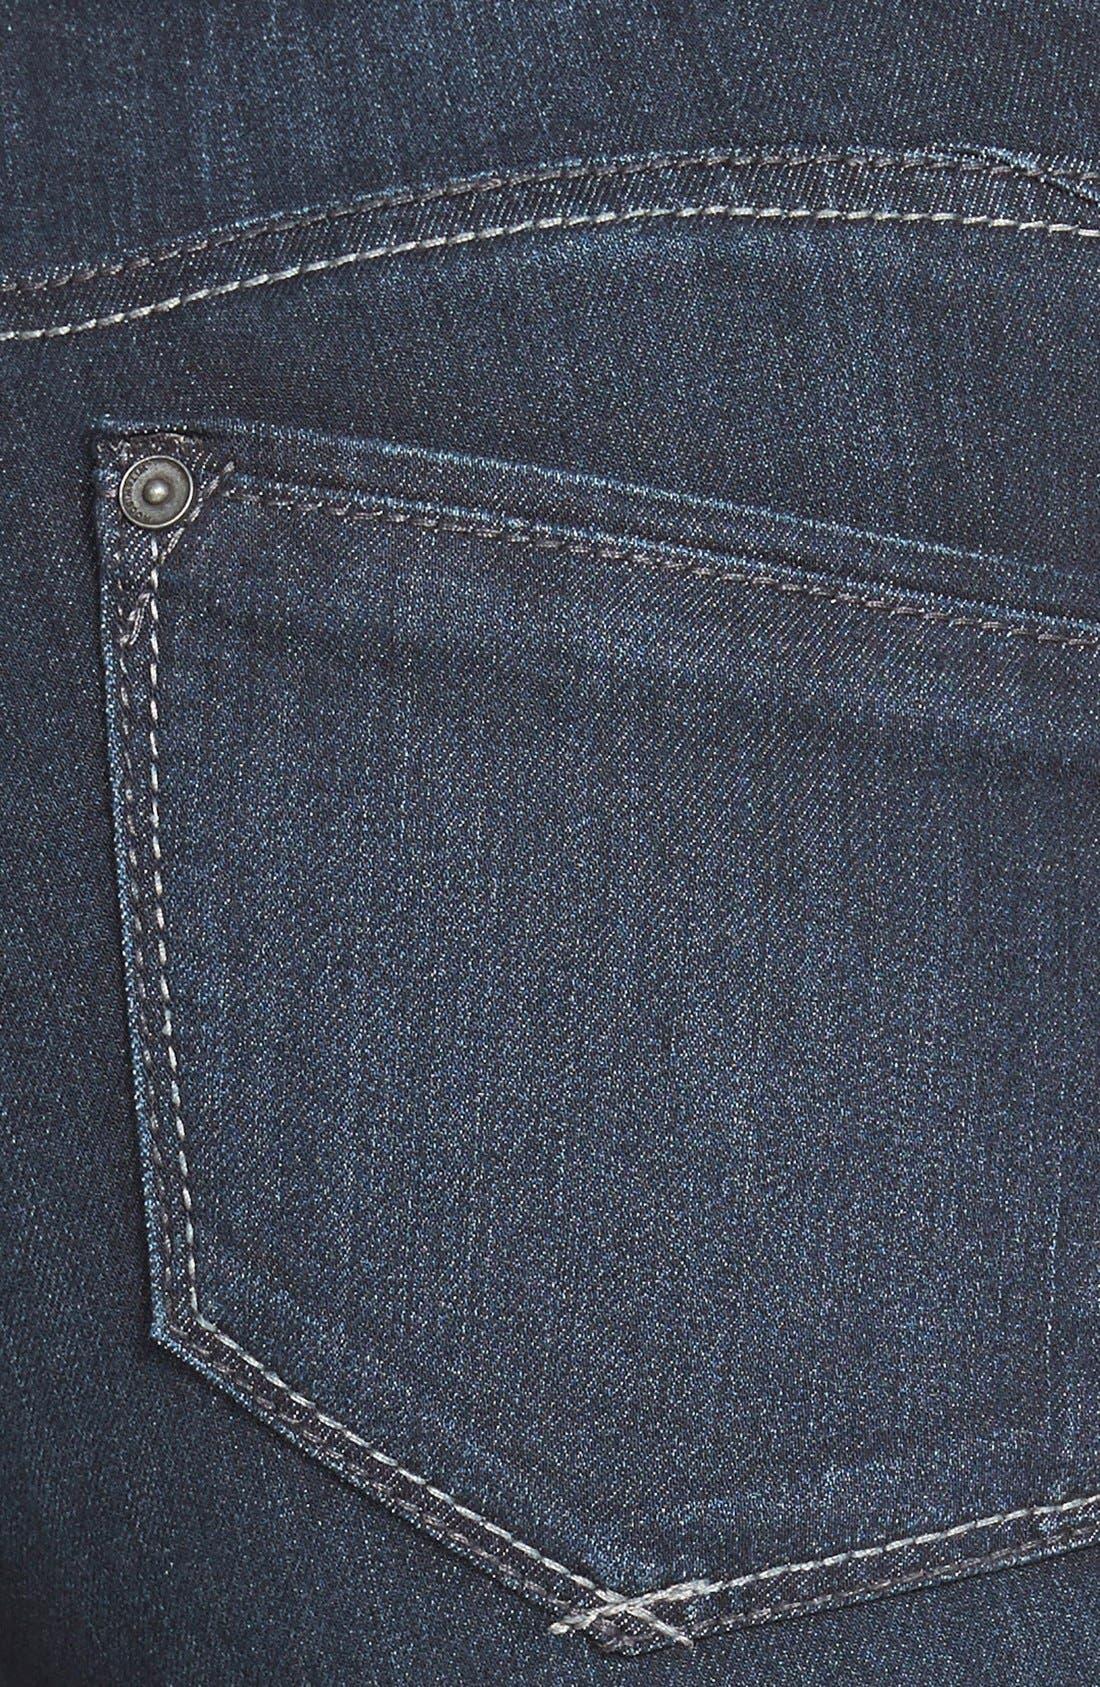 Alternate Image 4  - Wit & Wisdom Super Smooth Stretch Denim Skinny Jeans (Dark Navy) (Regular & Petite) (Nordstrom Exclusive)